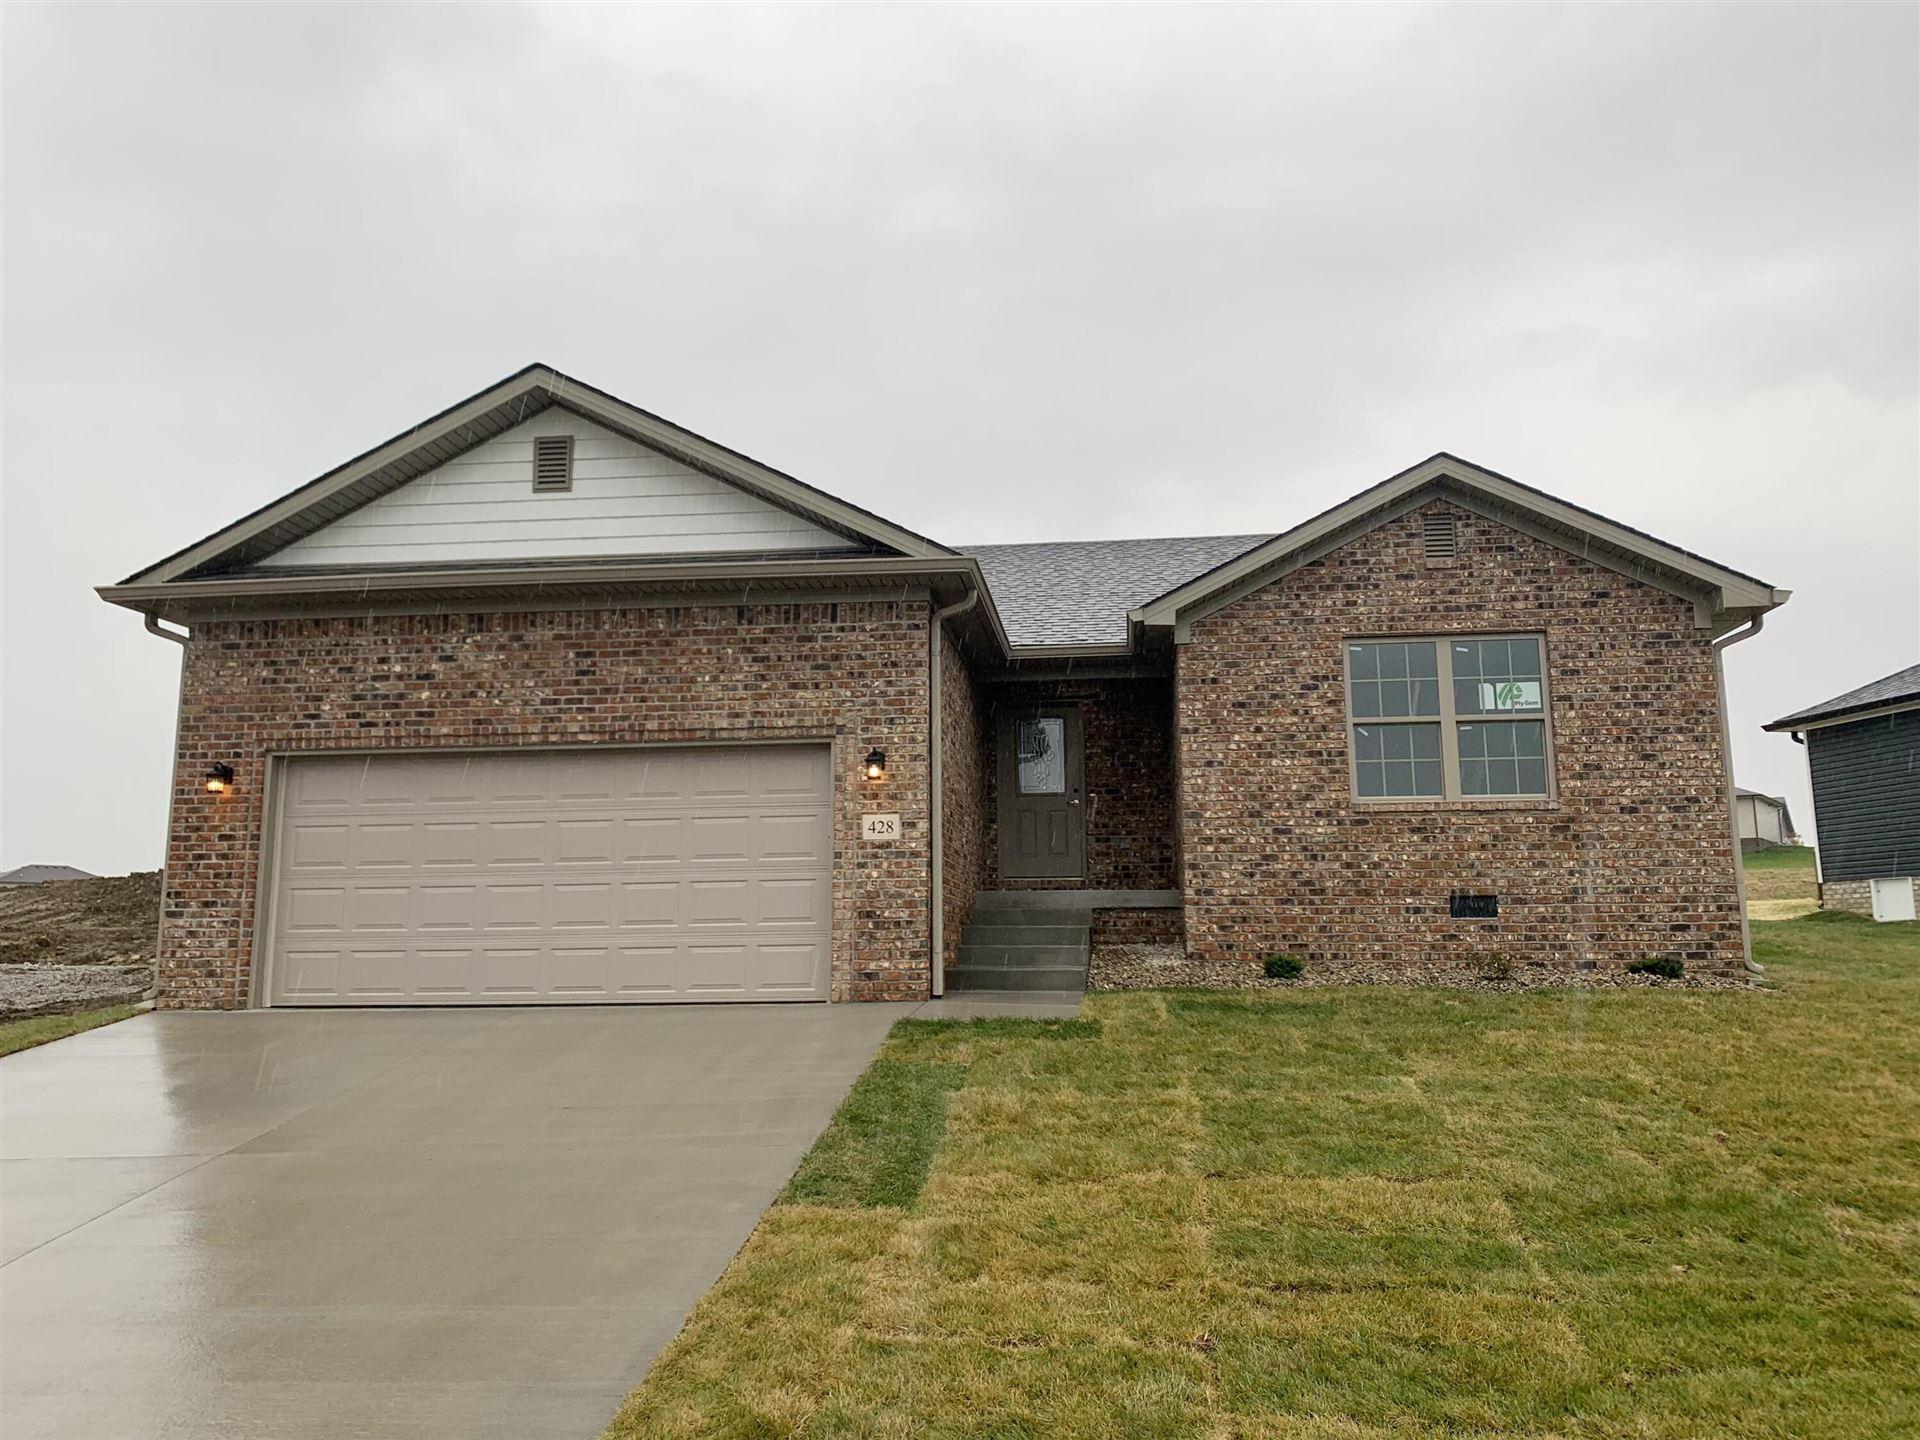 428 Middle Creek, Berea, KY 40403 - MLS#: 20121018